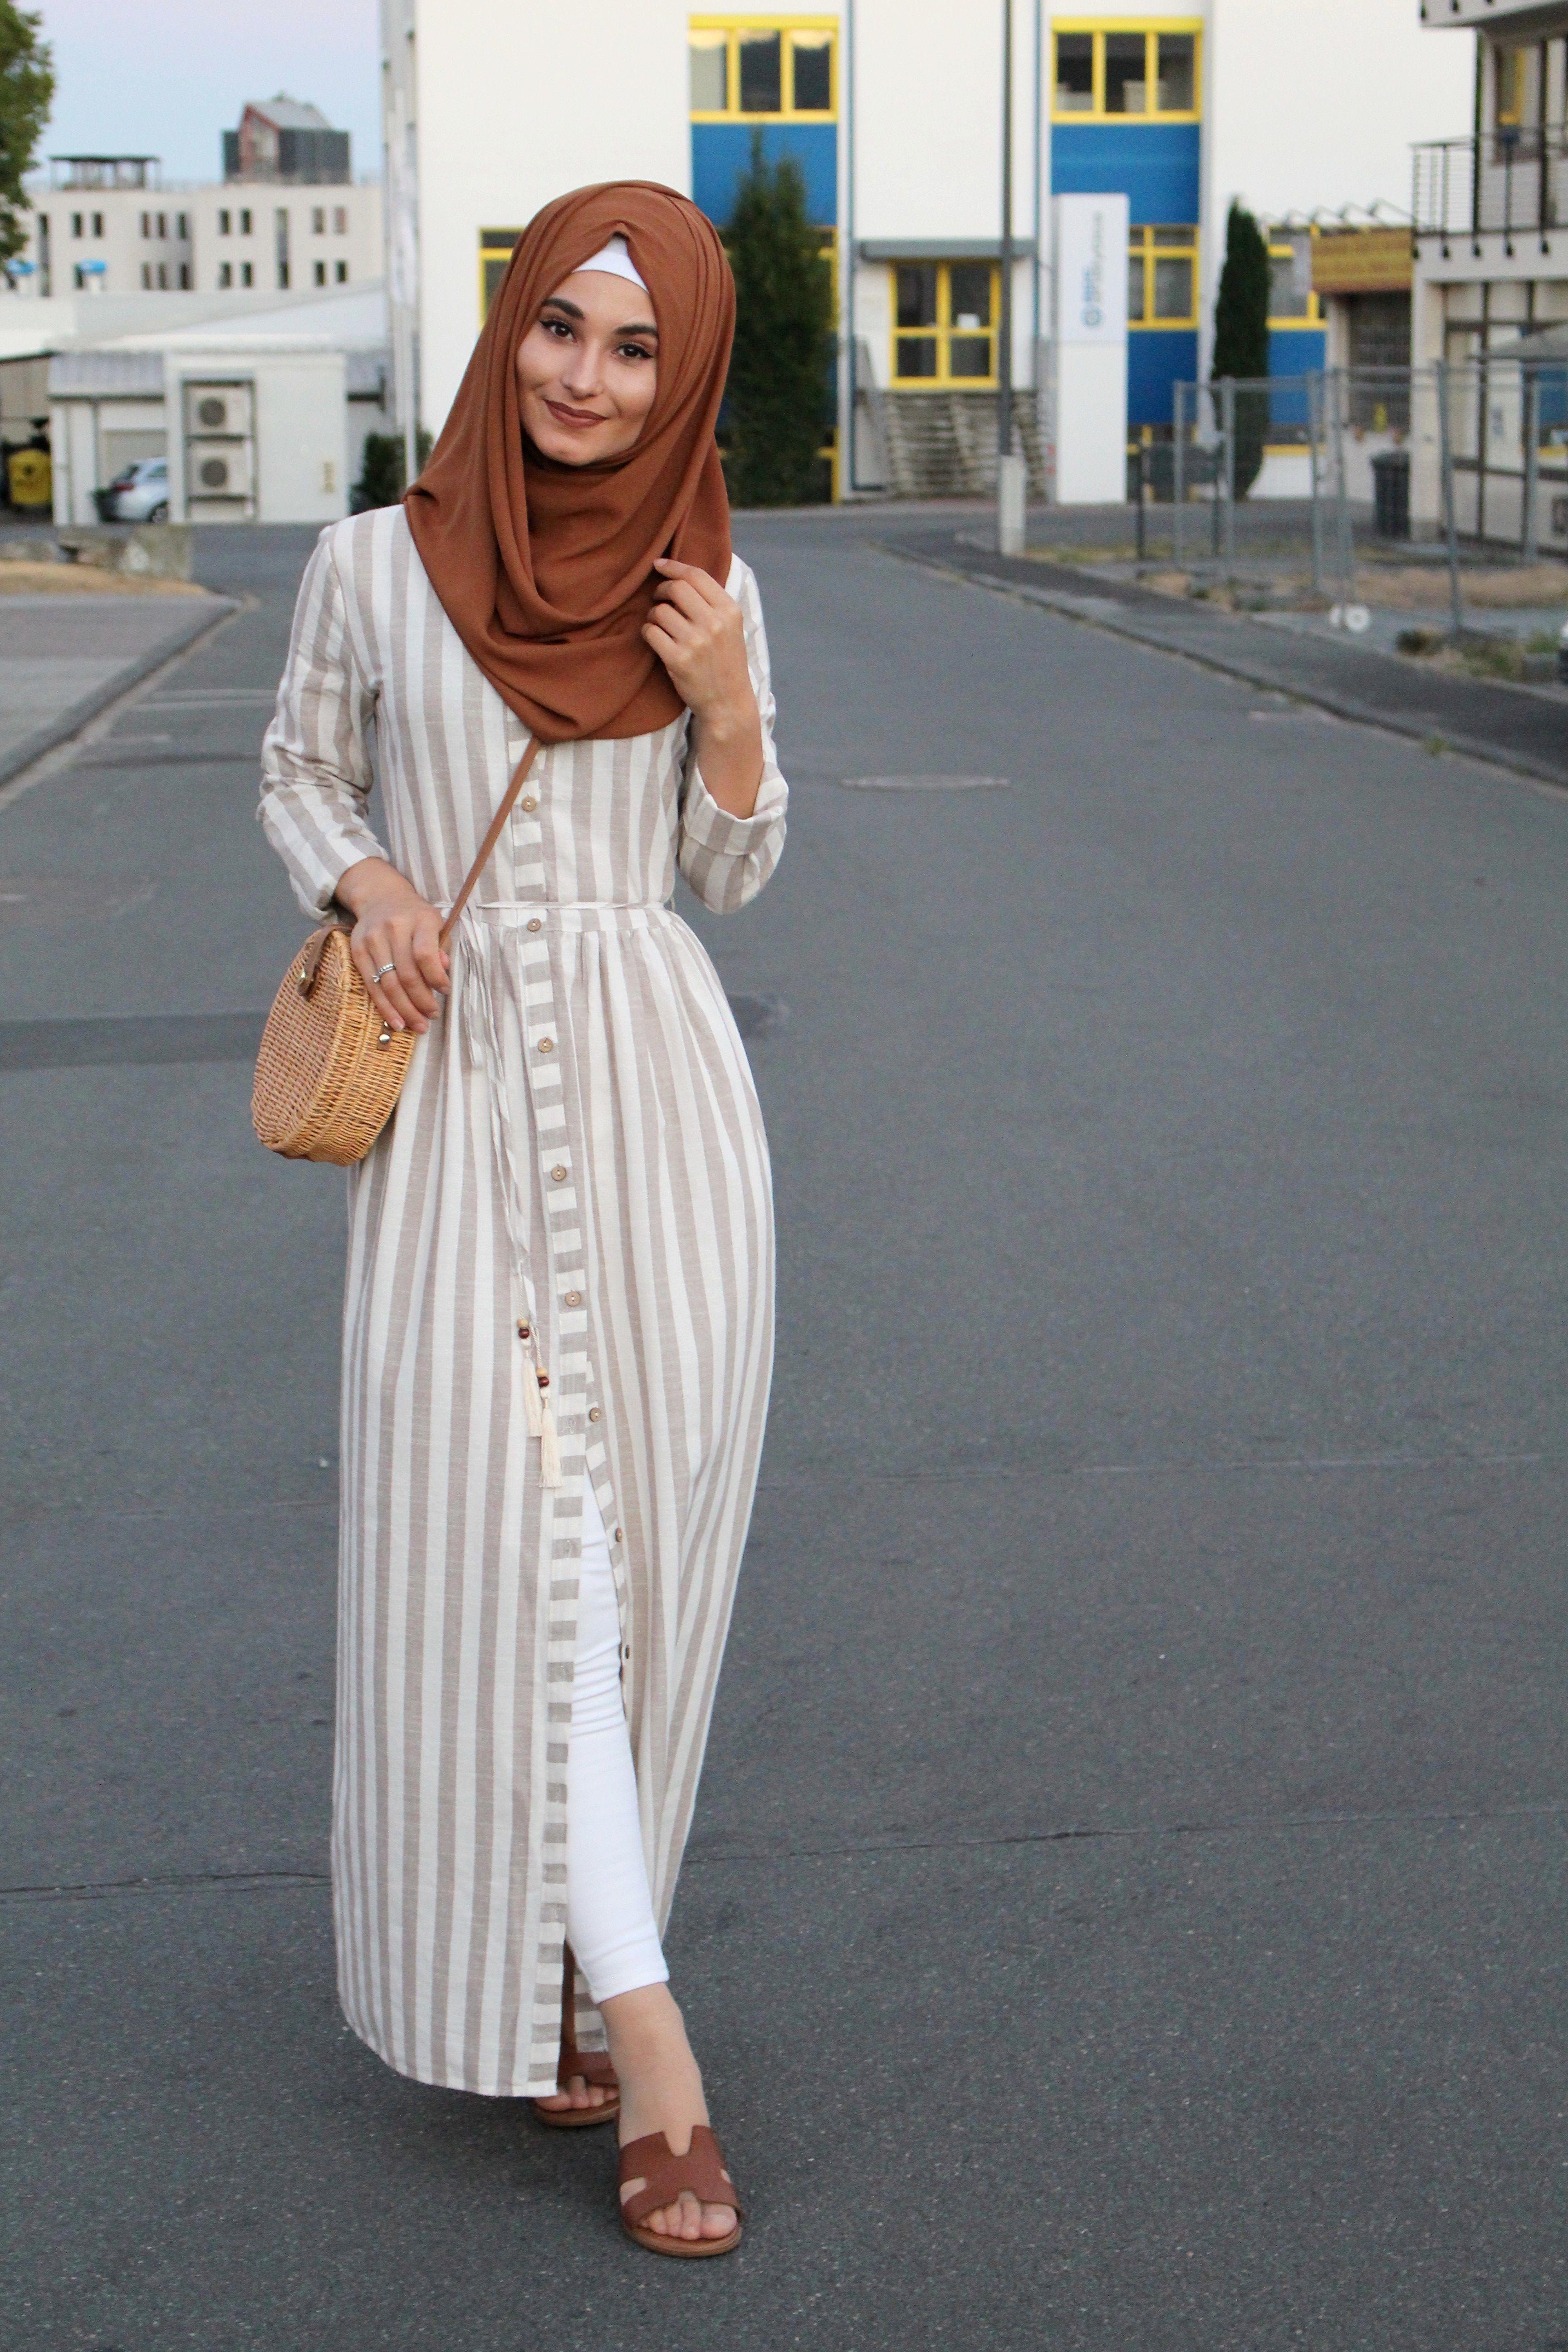 Hijab Kleidung Kleider Miss Elegance Shirt Dress Fashion Dresses